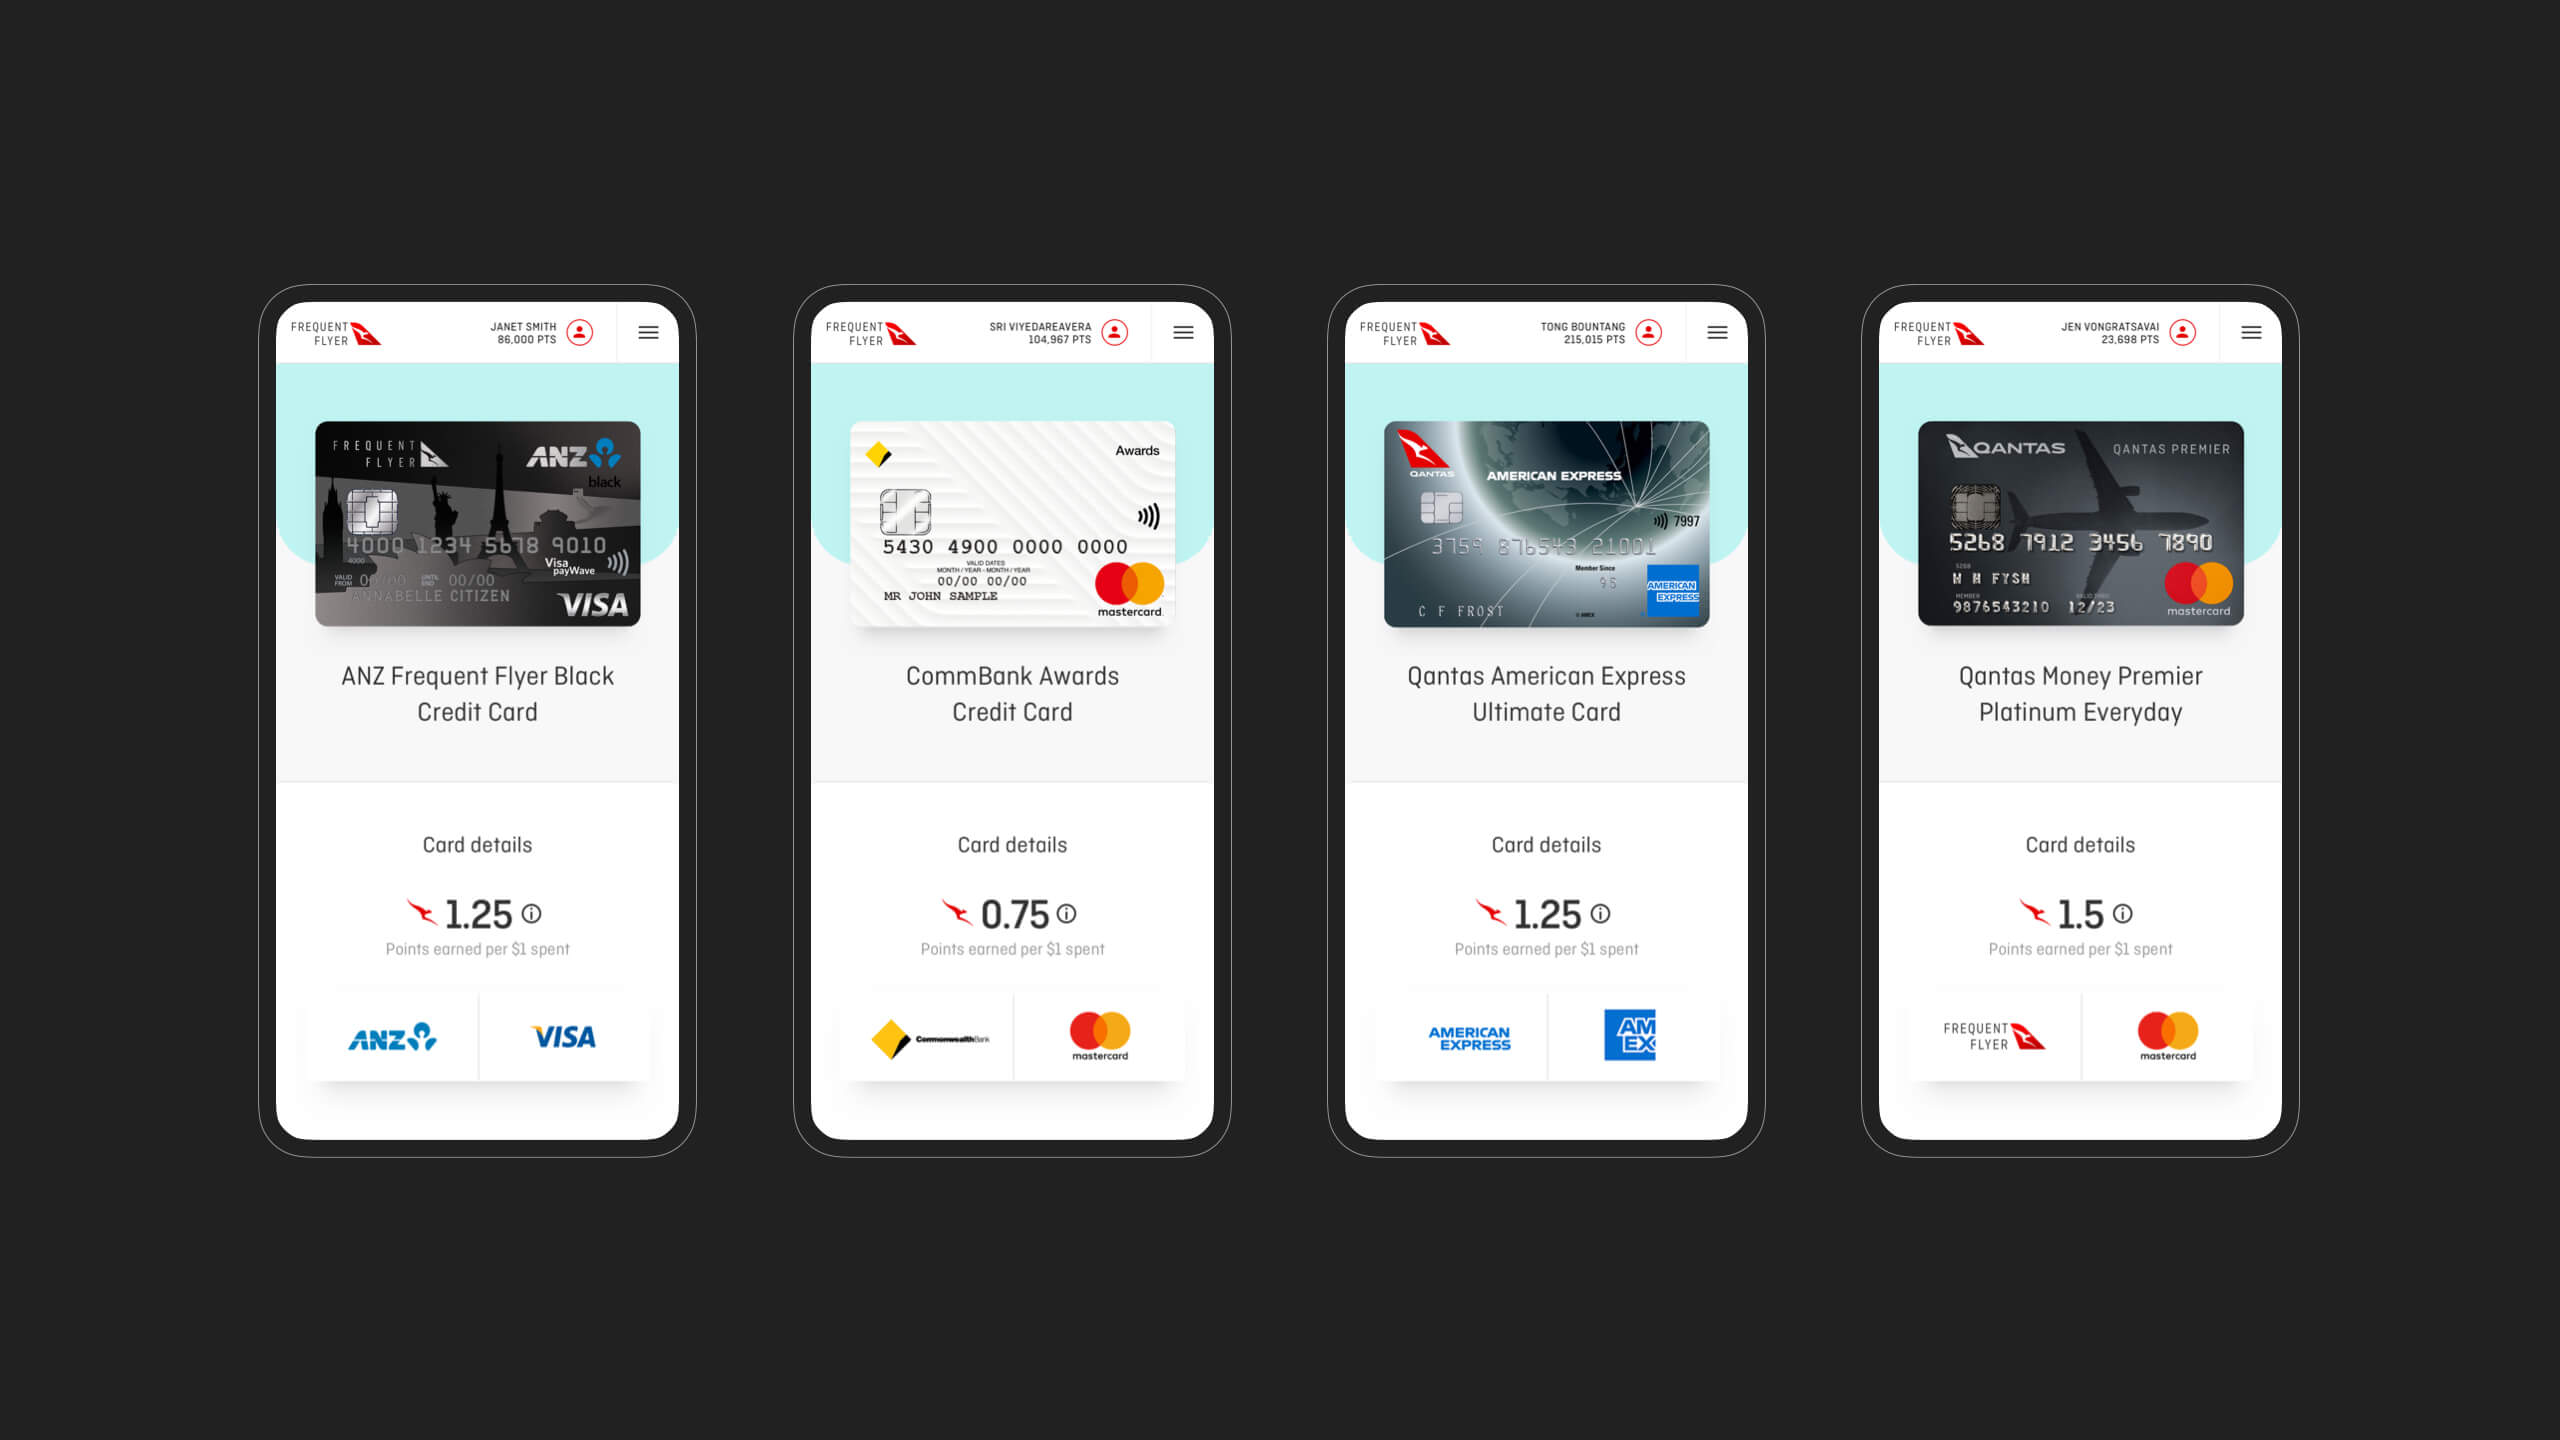 qantas-cc-your-cards-banks@1x